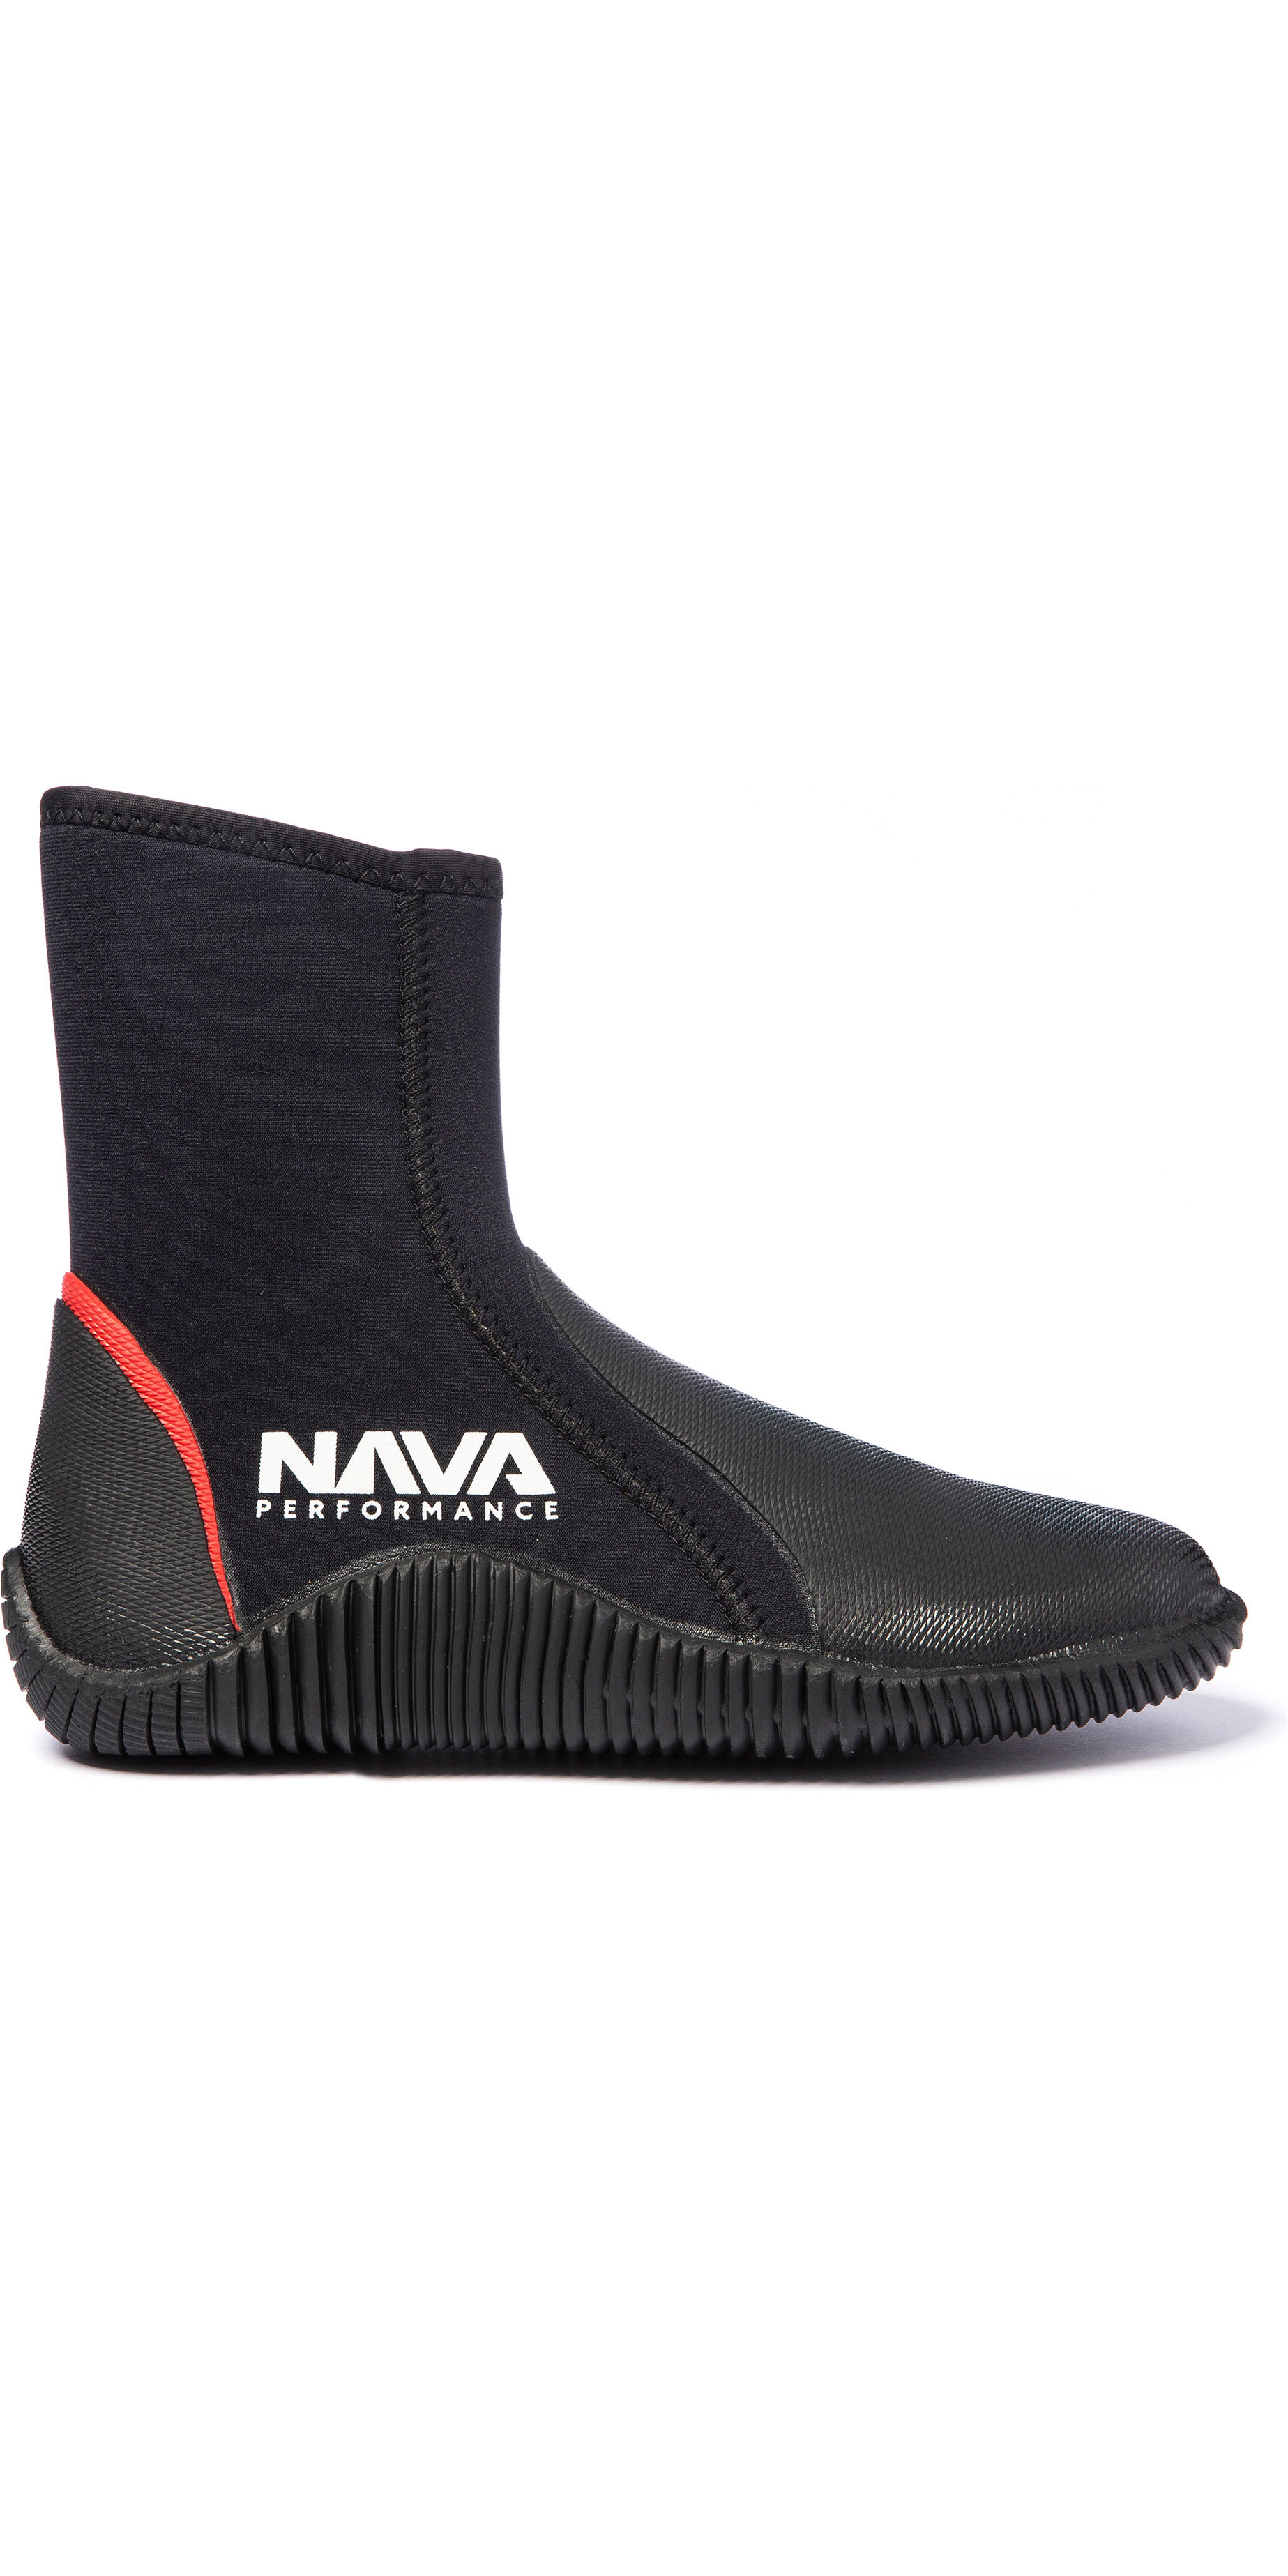 Botas Con Cremallera De Neopreno 2020 Nava Performance 5mm Navabt02 - Negro